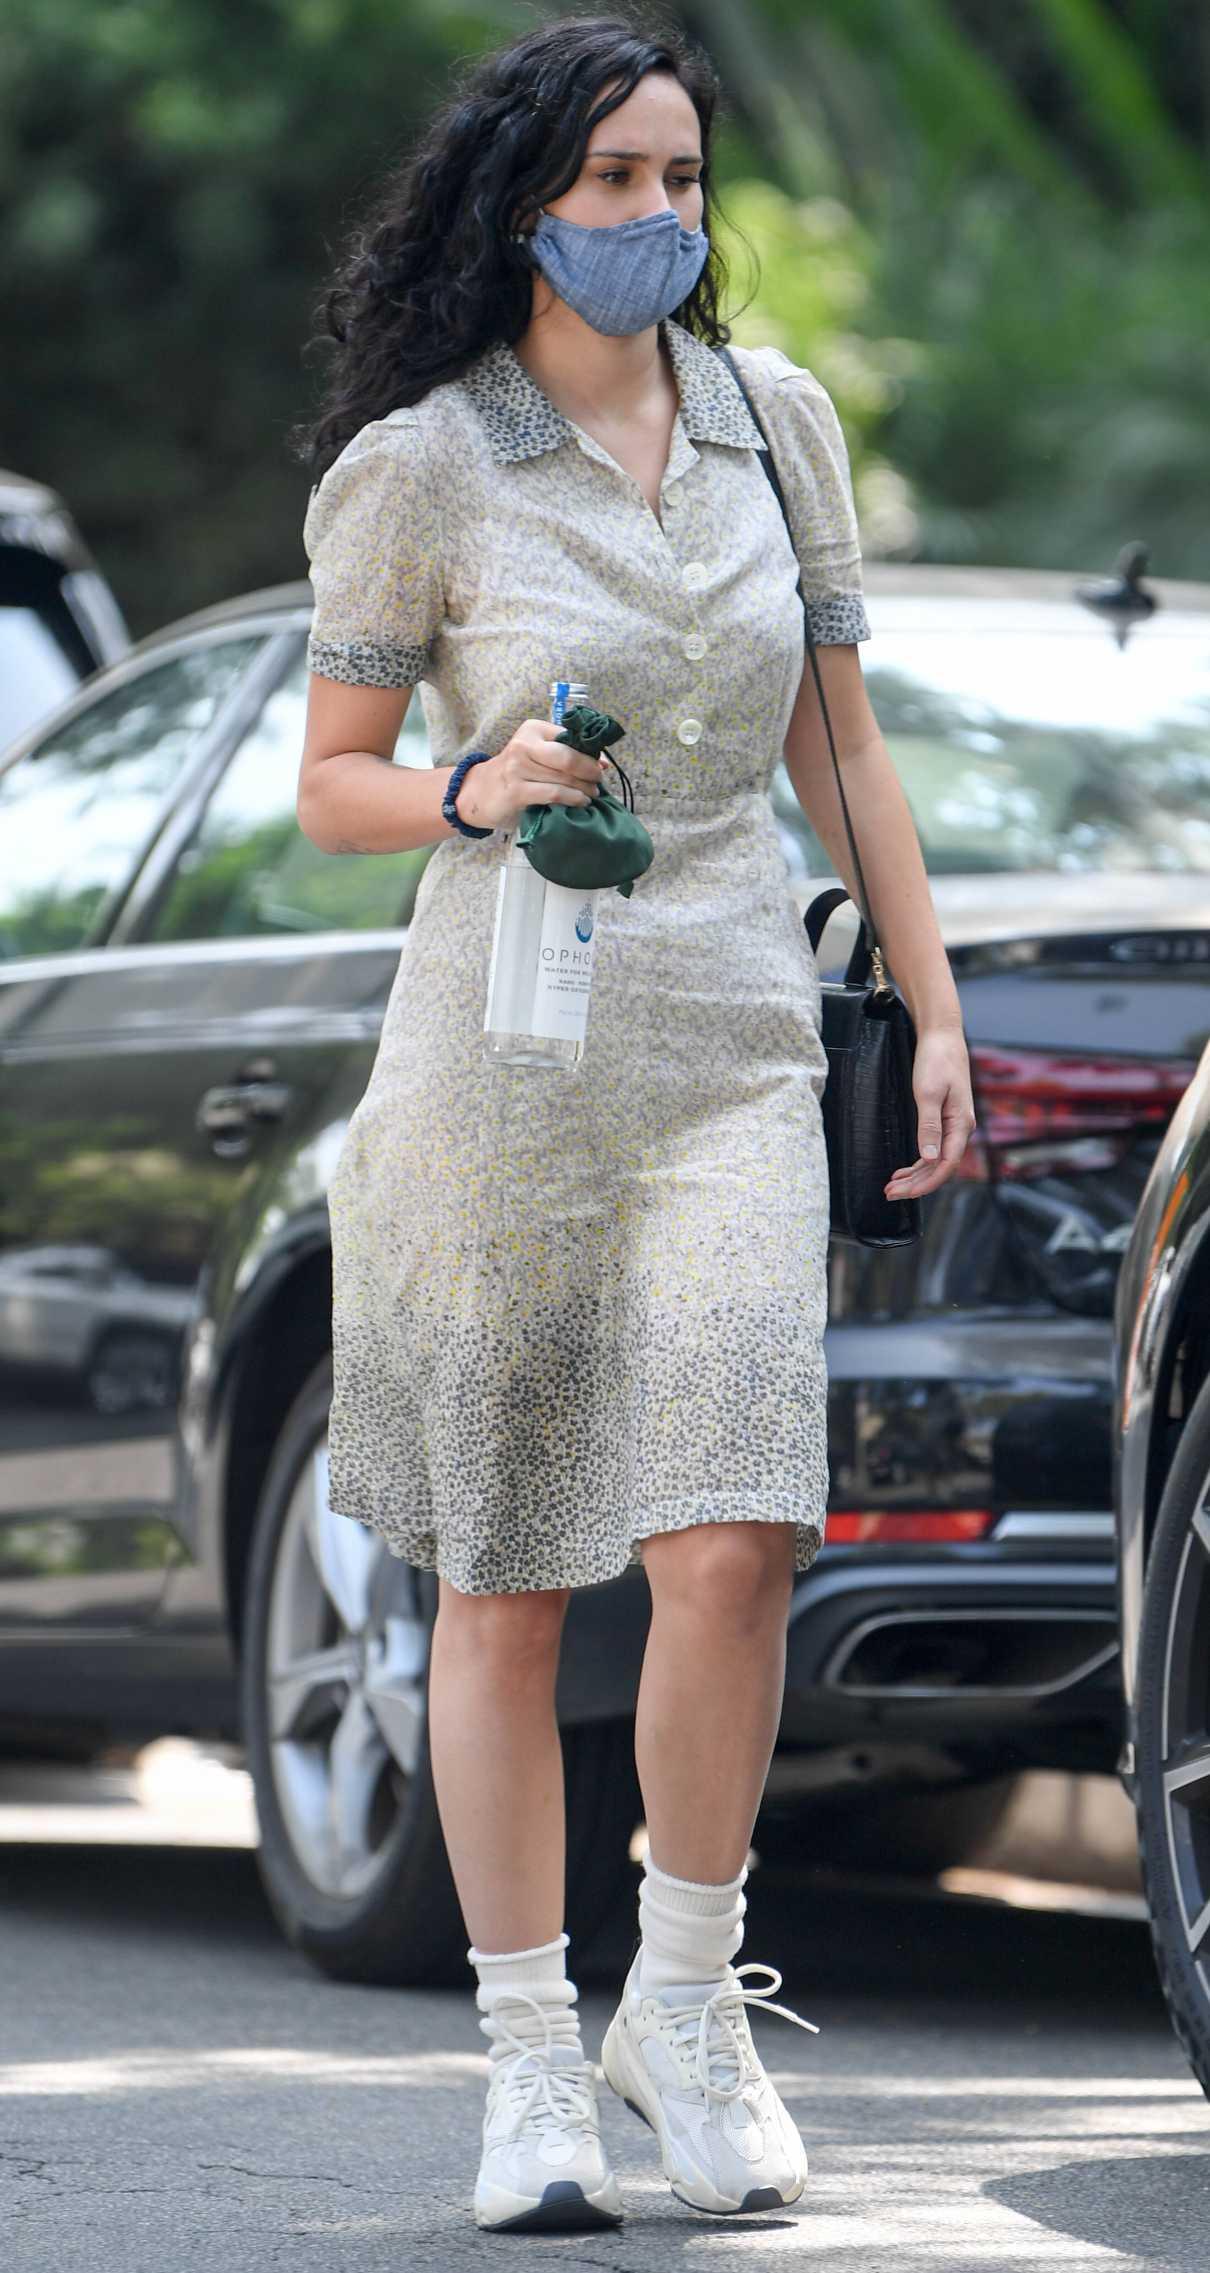 Rumer Willis in a Grey Floral Dress